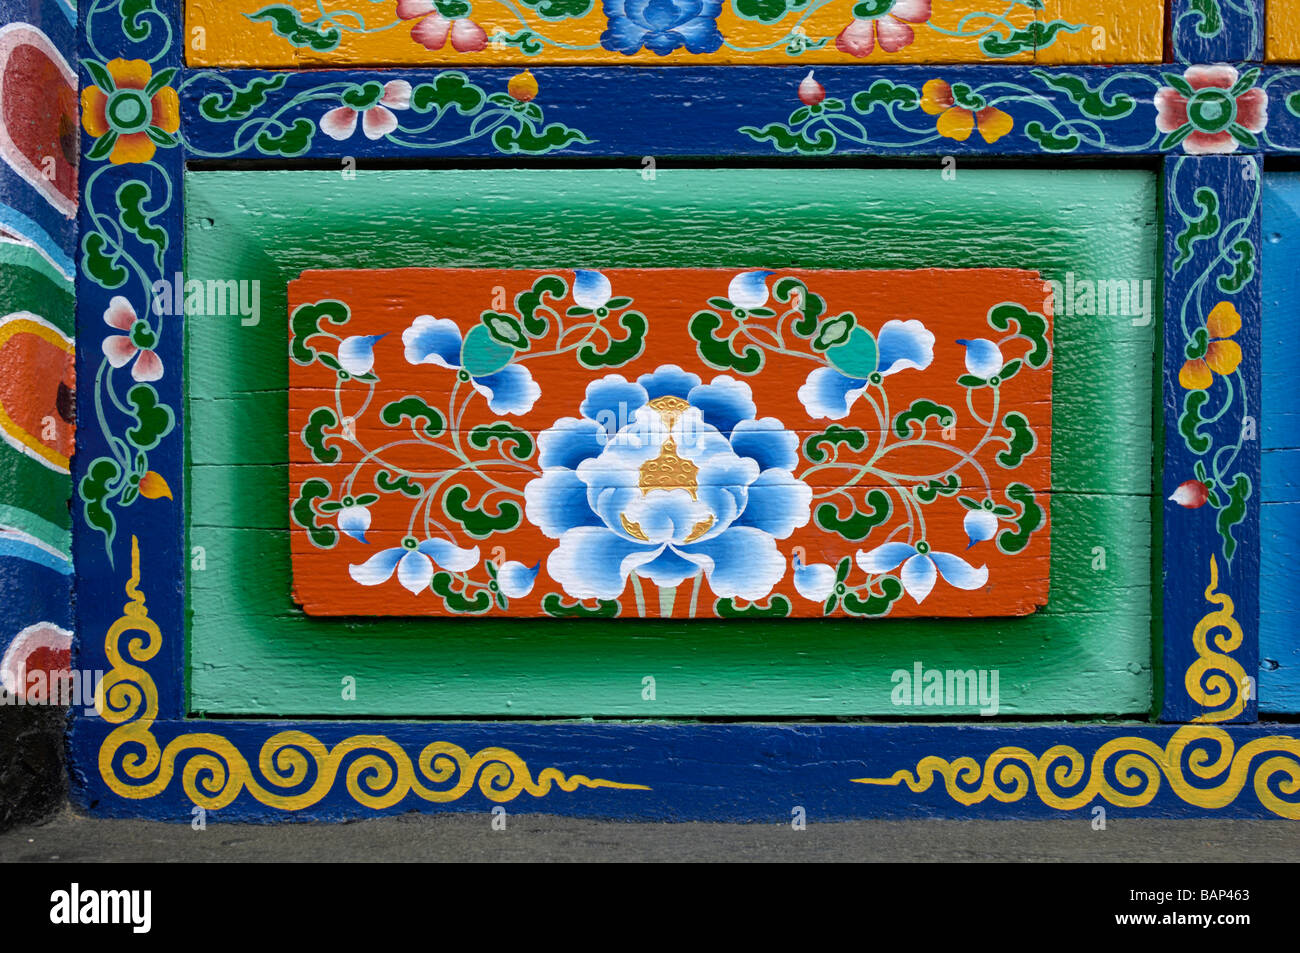 Tibetan Buddhist Symbols Stock Photos & Tibetan Buddhist Symbols